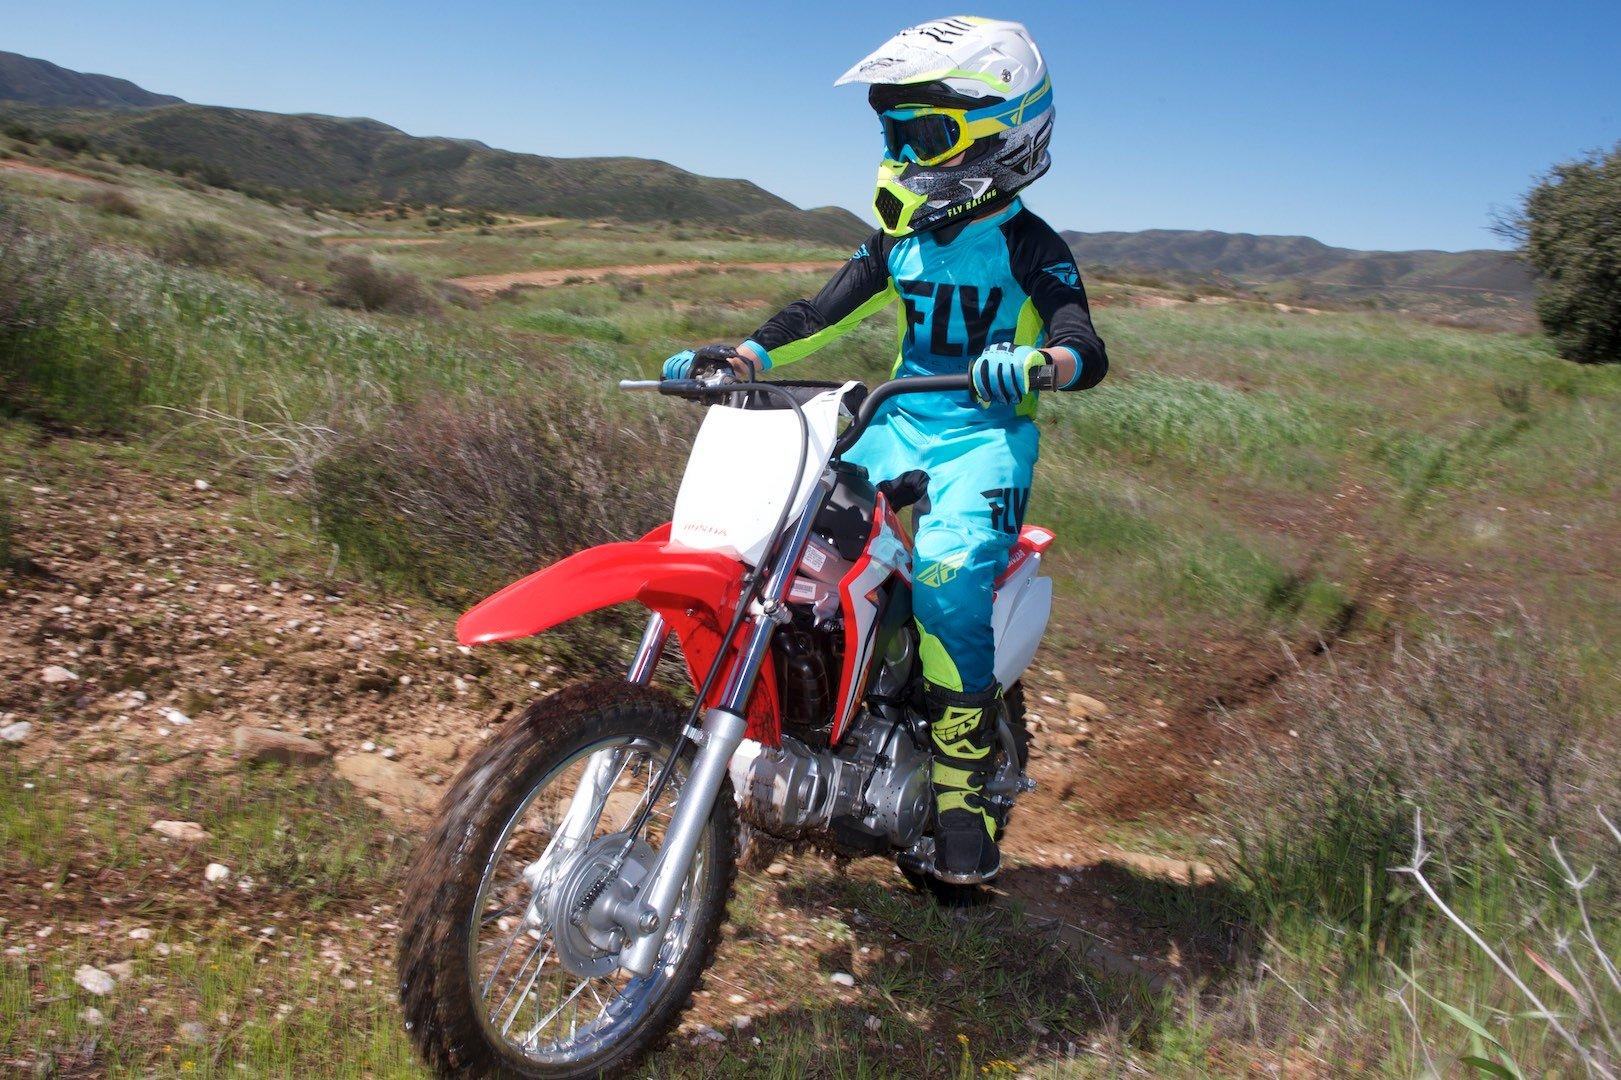 2019 Honda CRF110F review